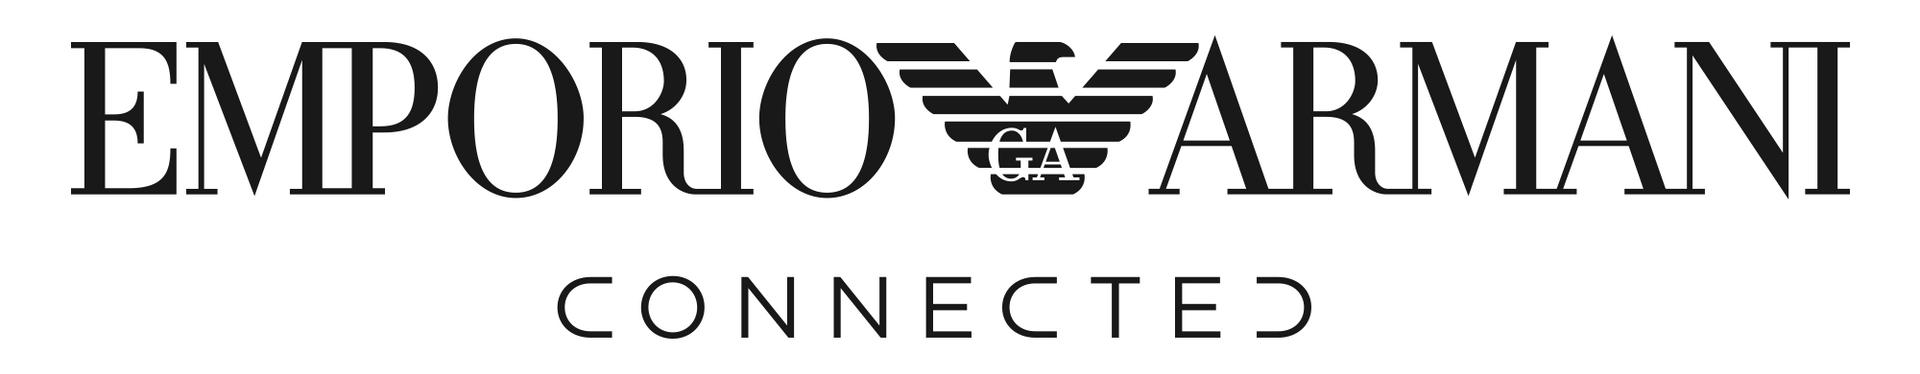 Emporio-Armani-Connected-Logo.png